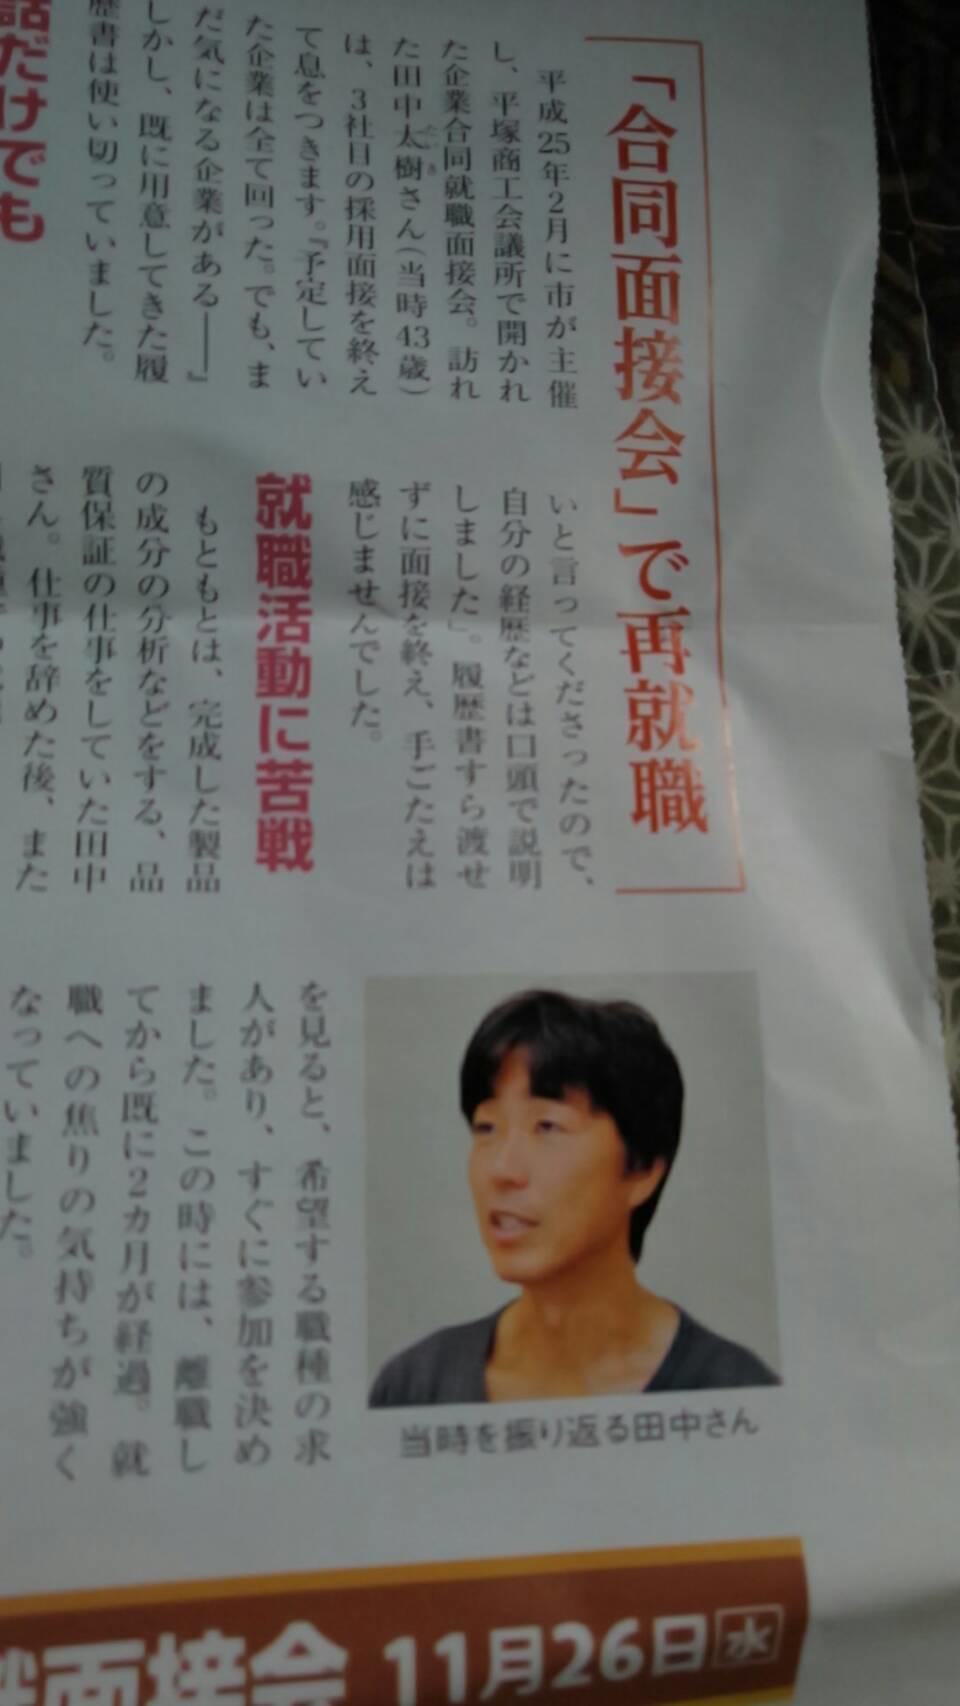 https://el.jibun.atmarkit.co.jp/taiki/112519.jpg